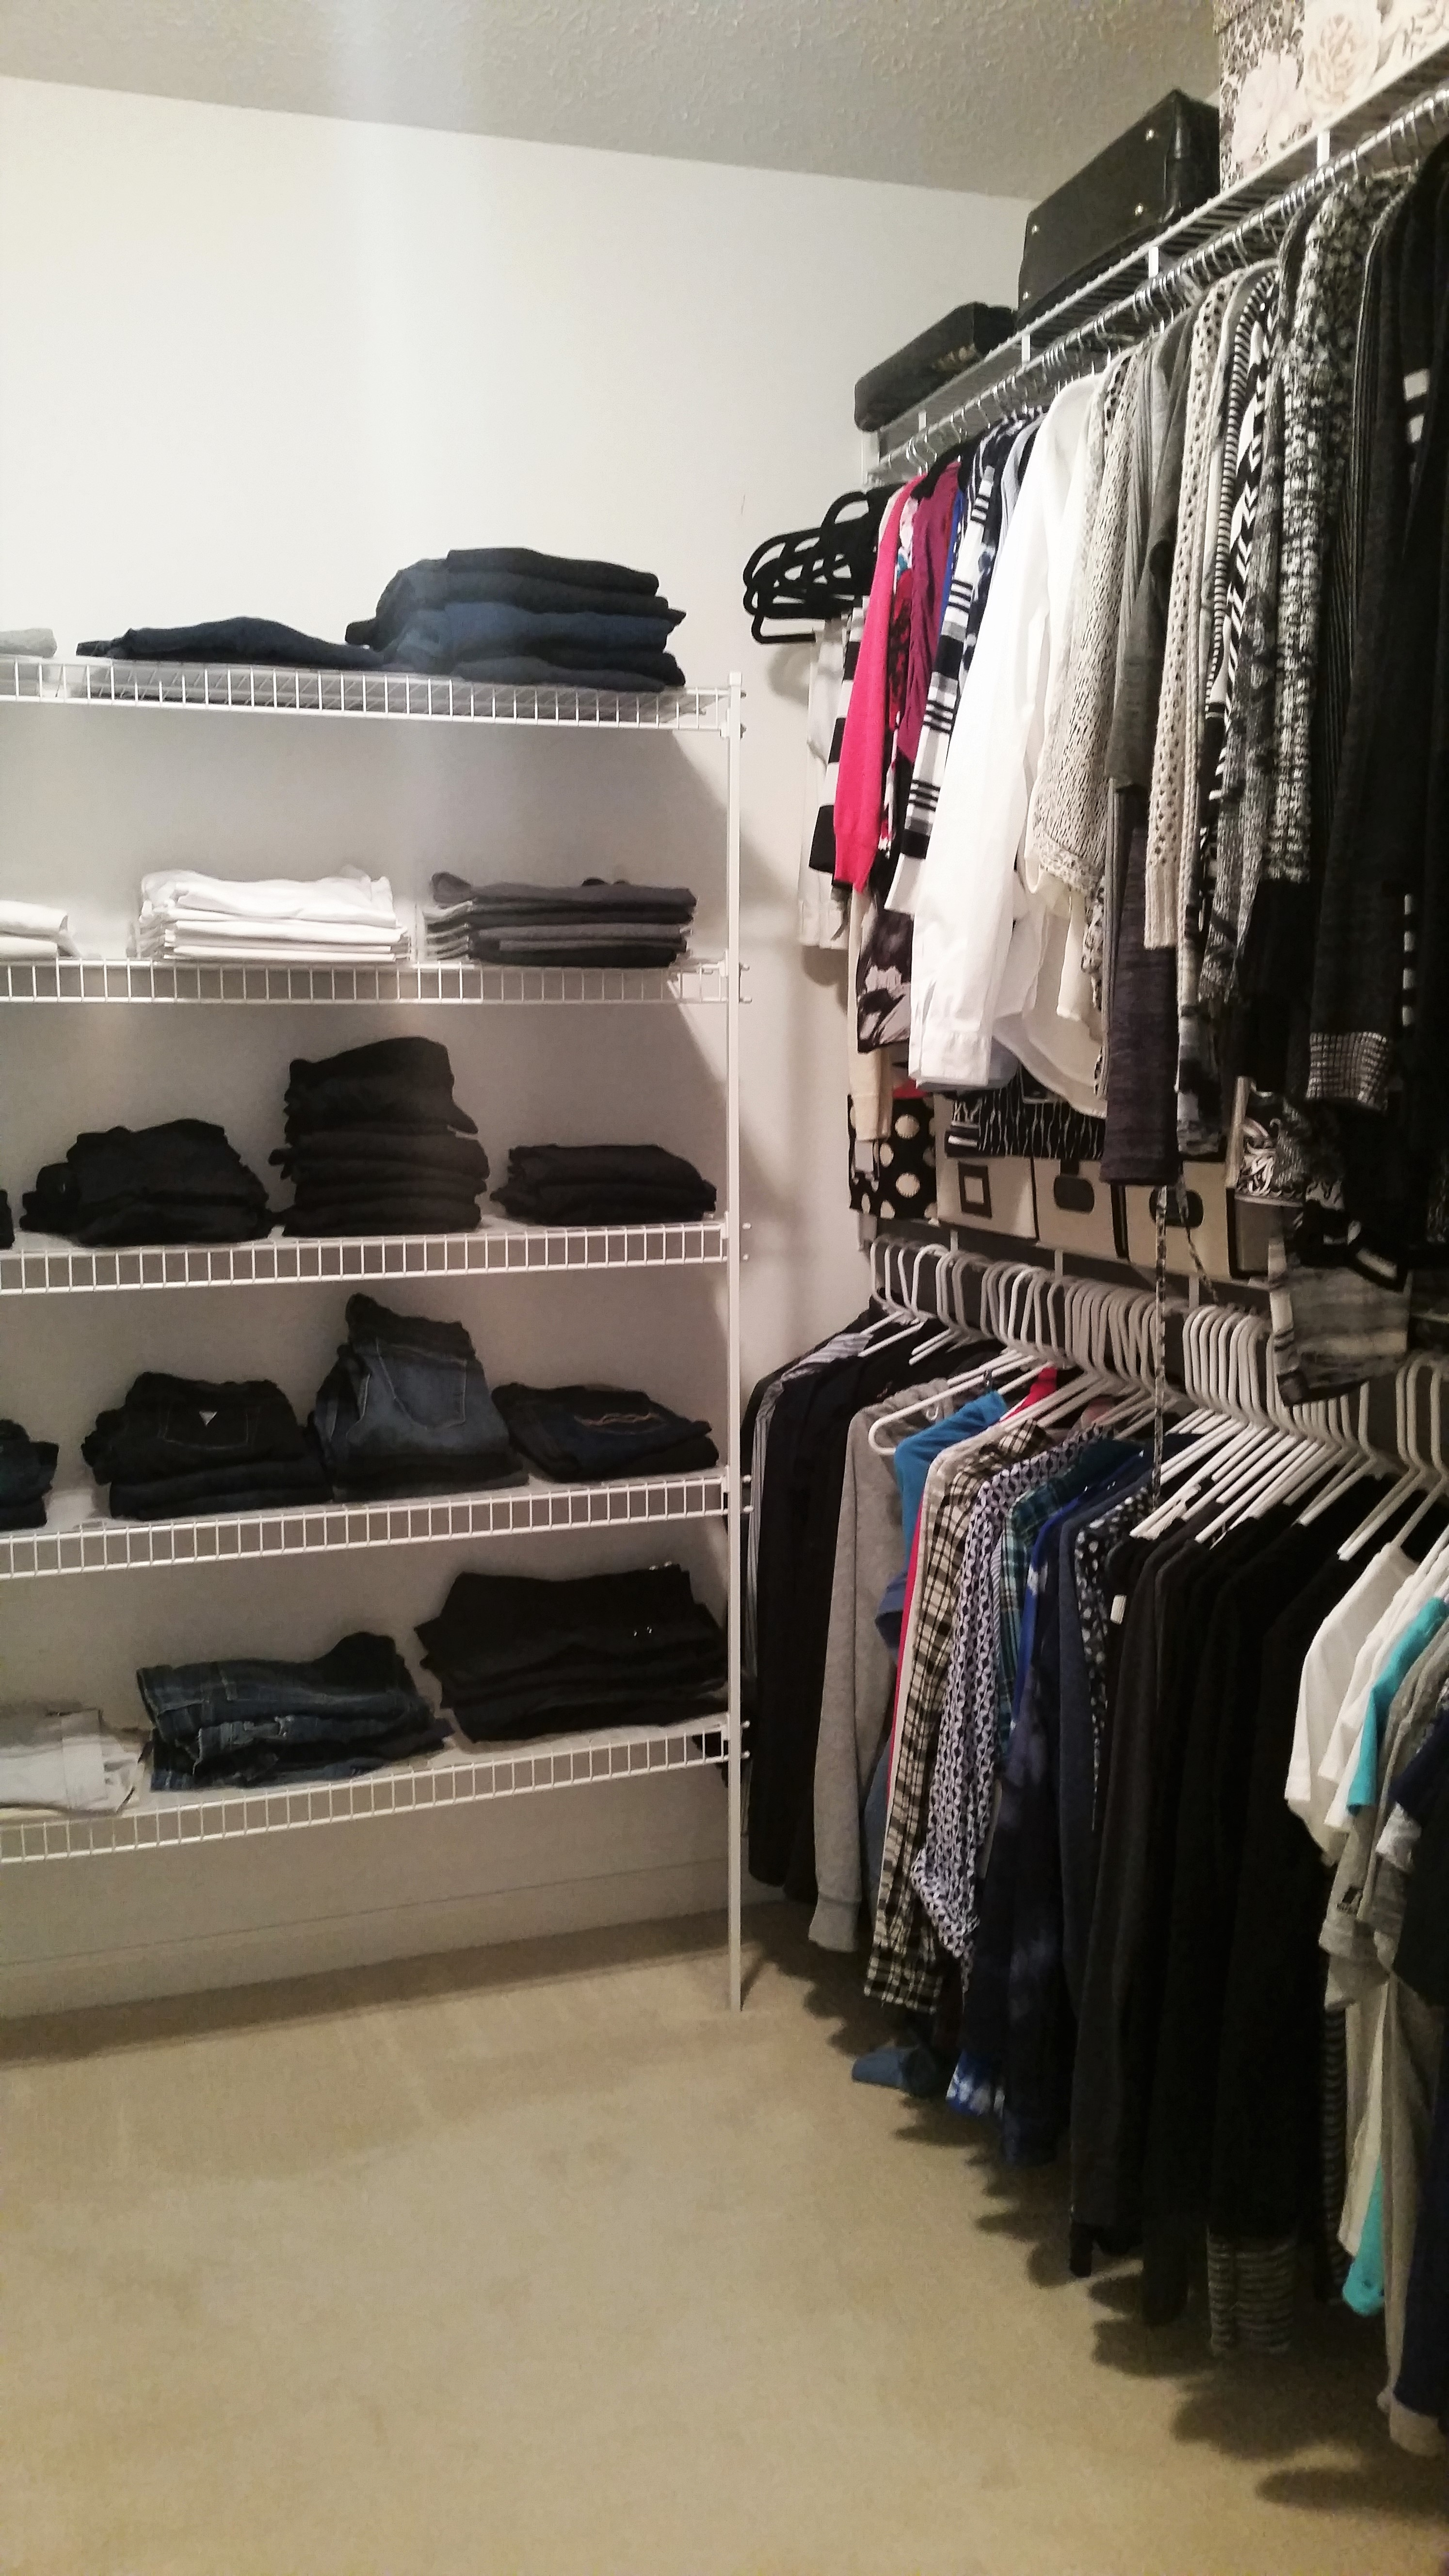 Closet before Y